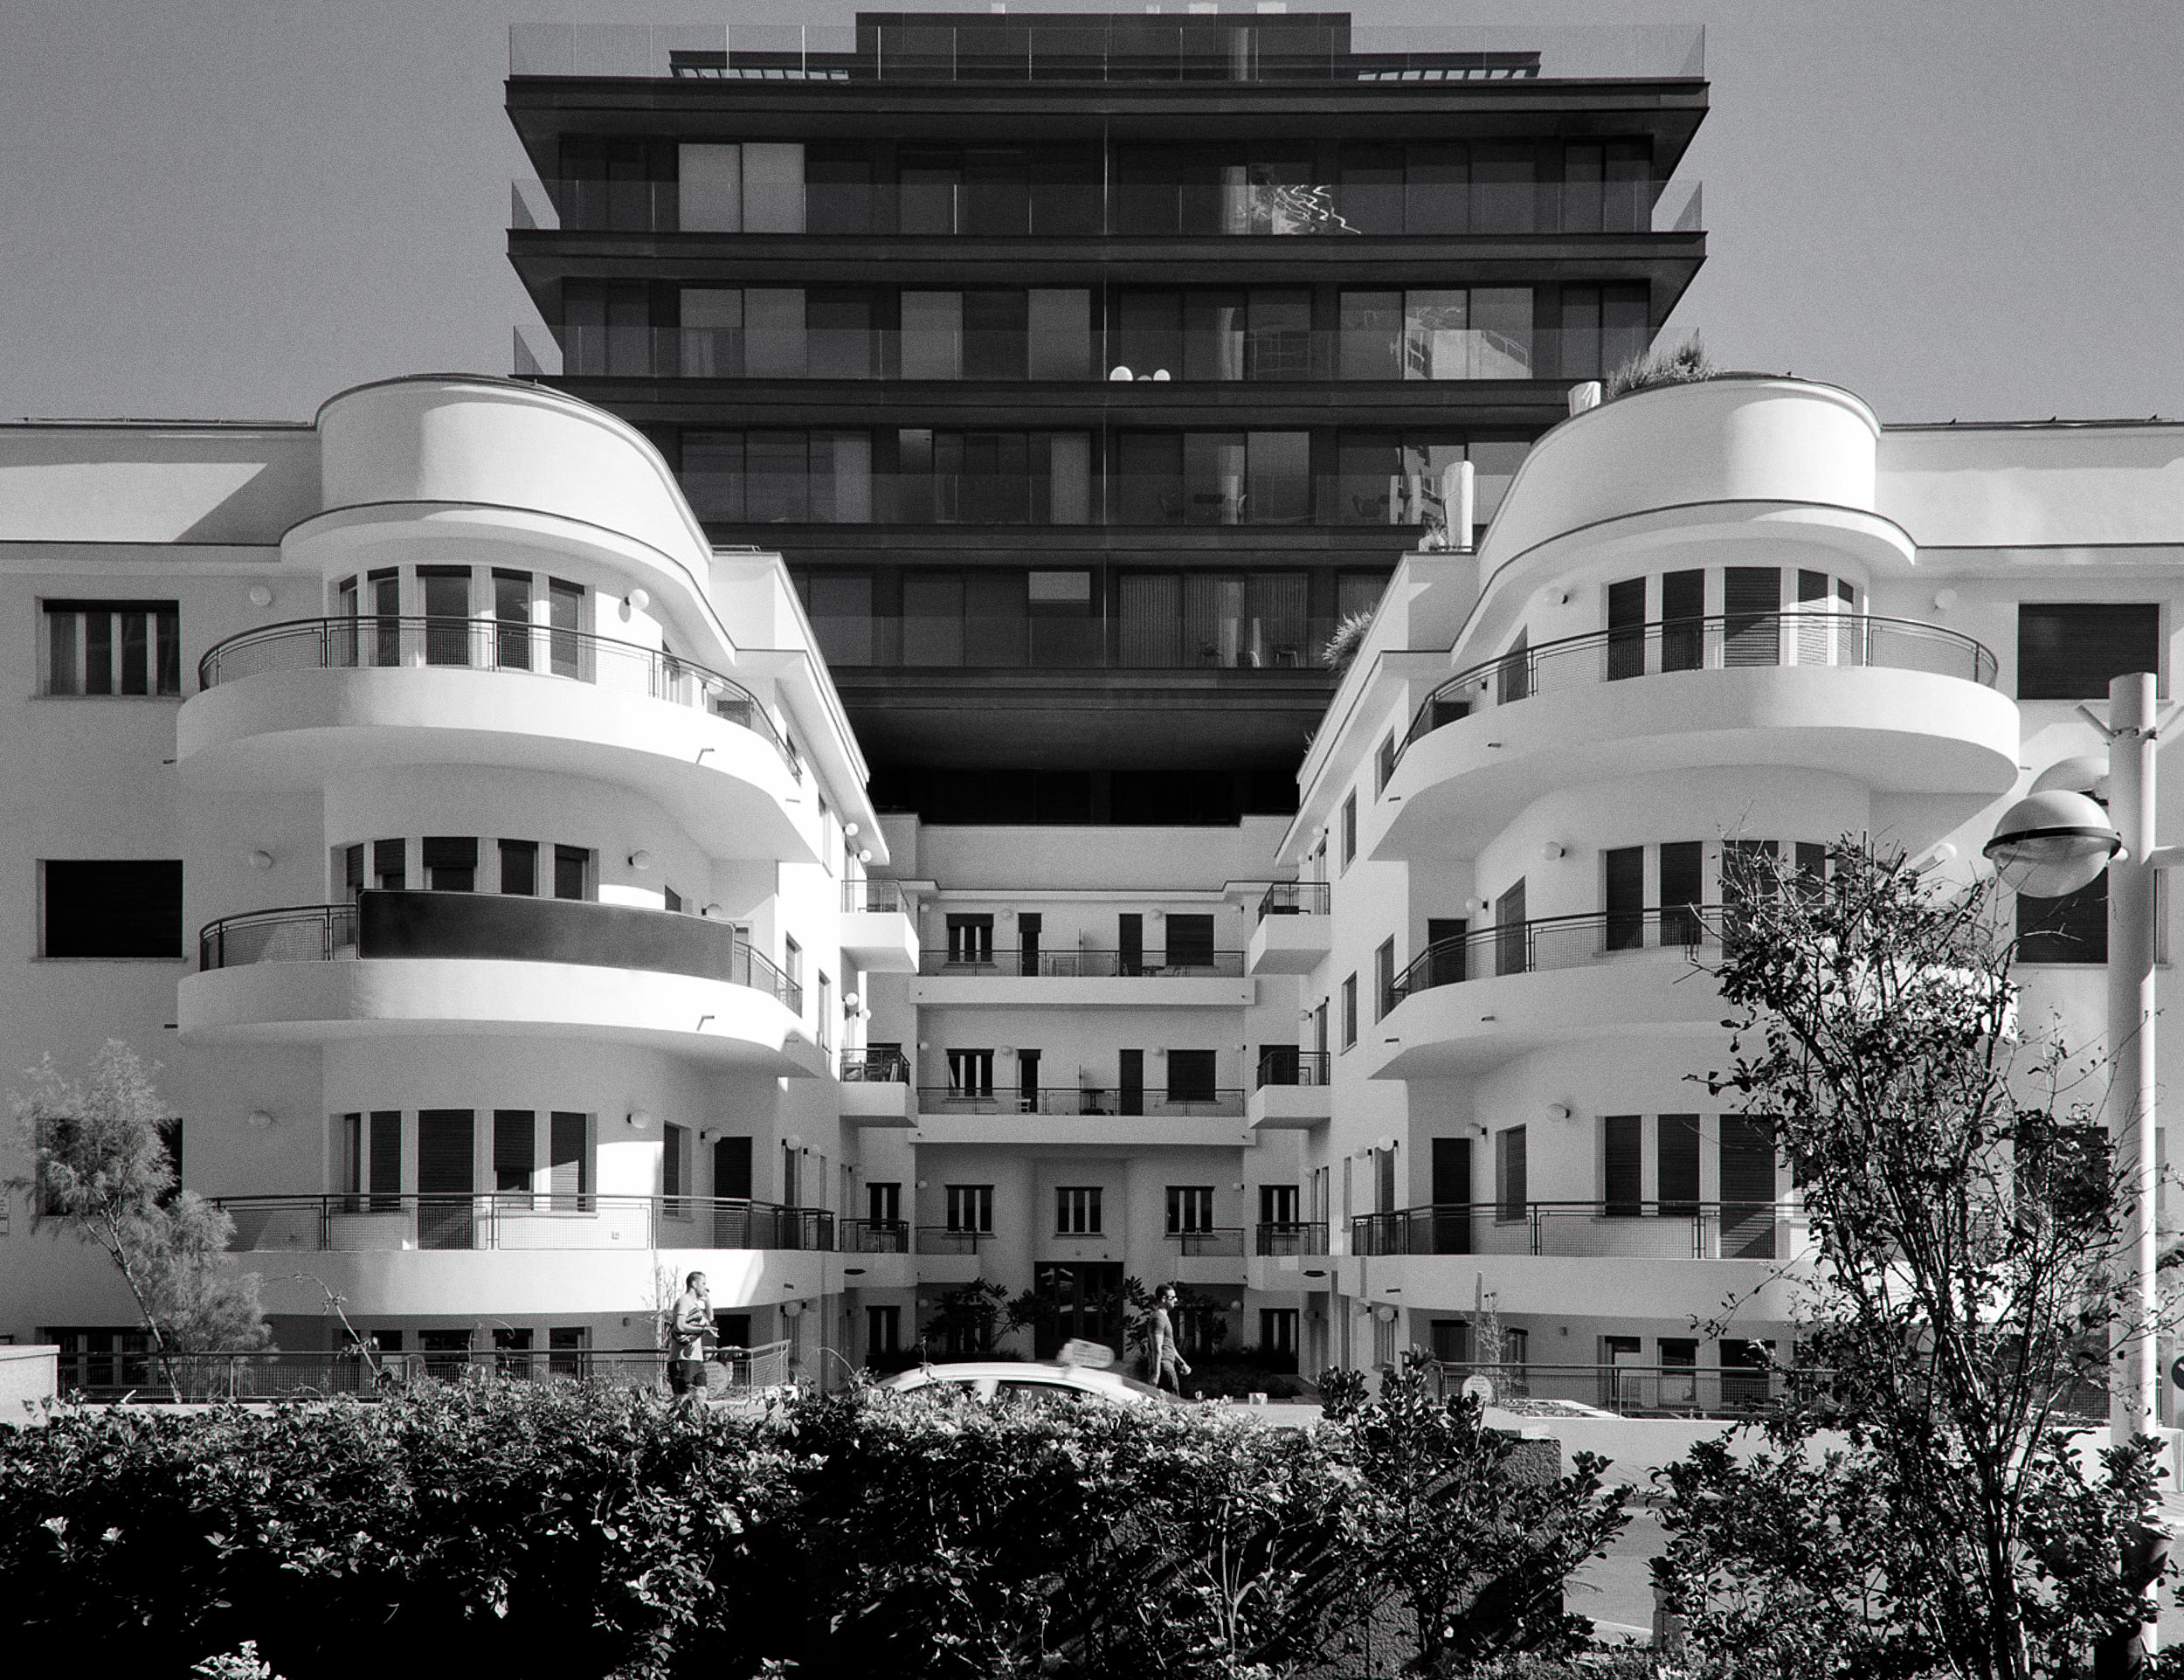 96 Ha-Yarkon St. by Amnon Bar Or —Tal Gazit Architects - Image by Avi Levi